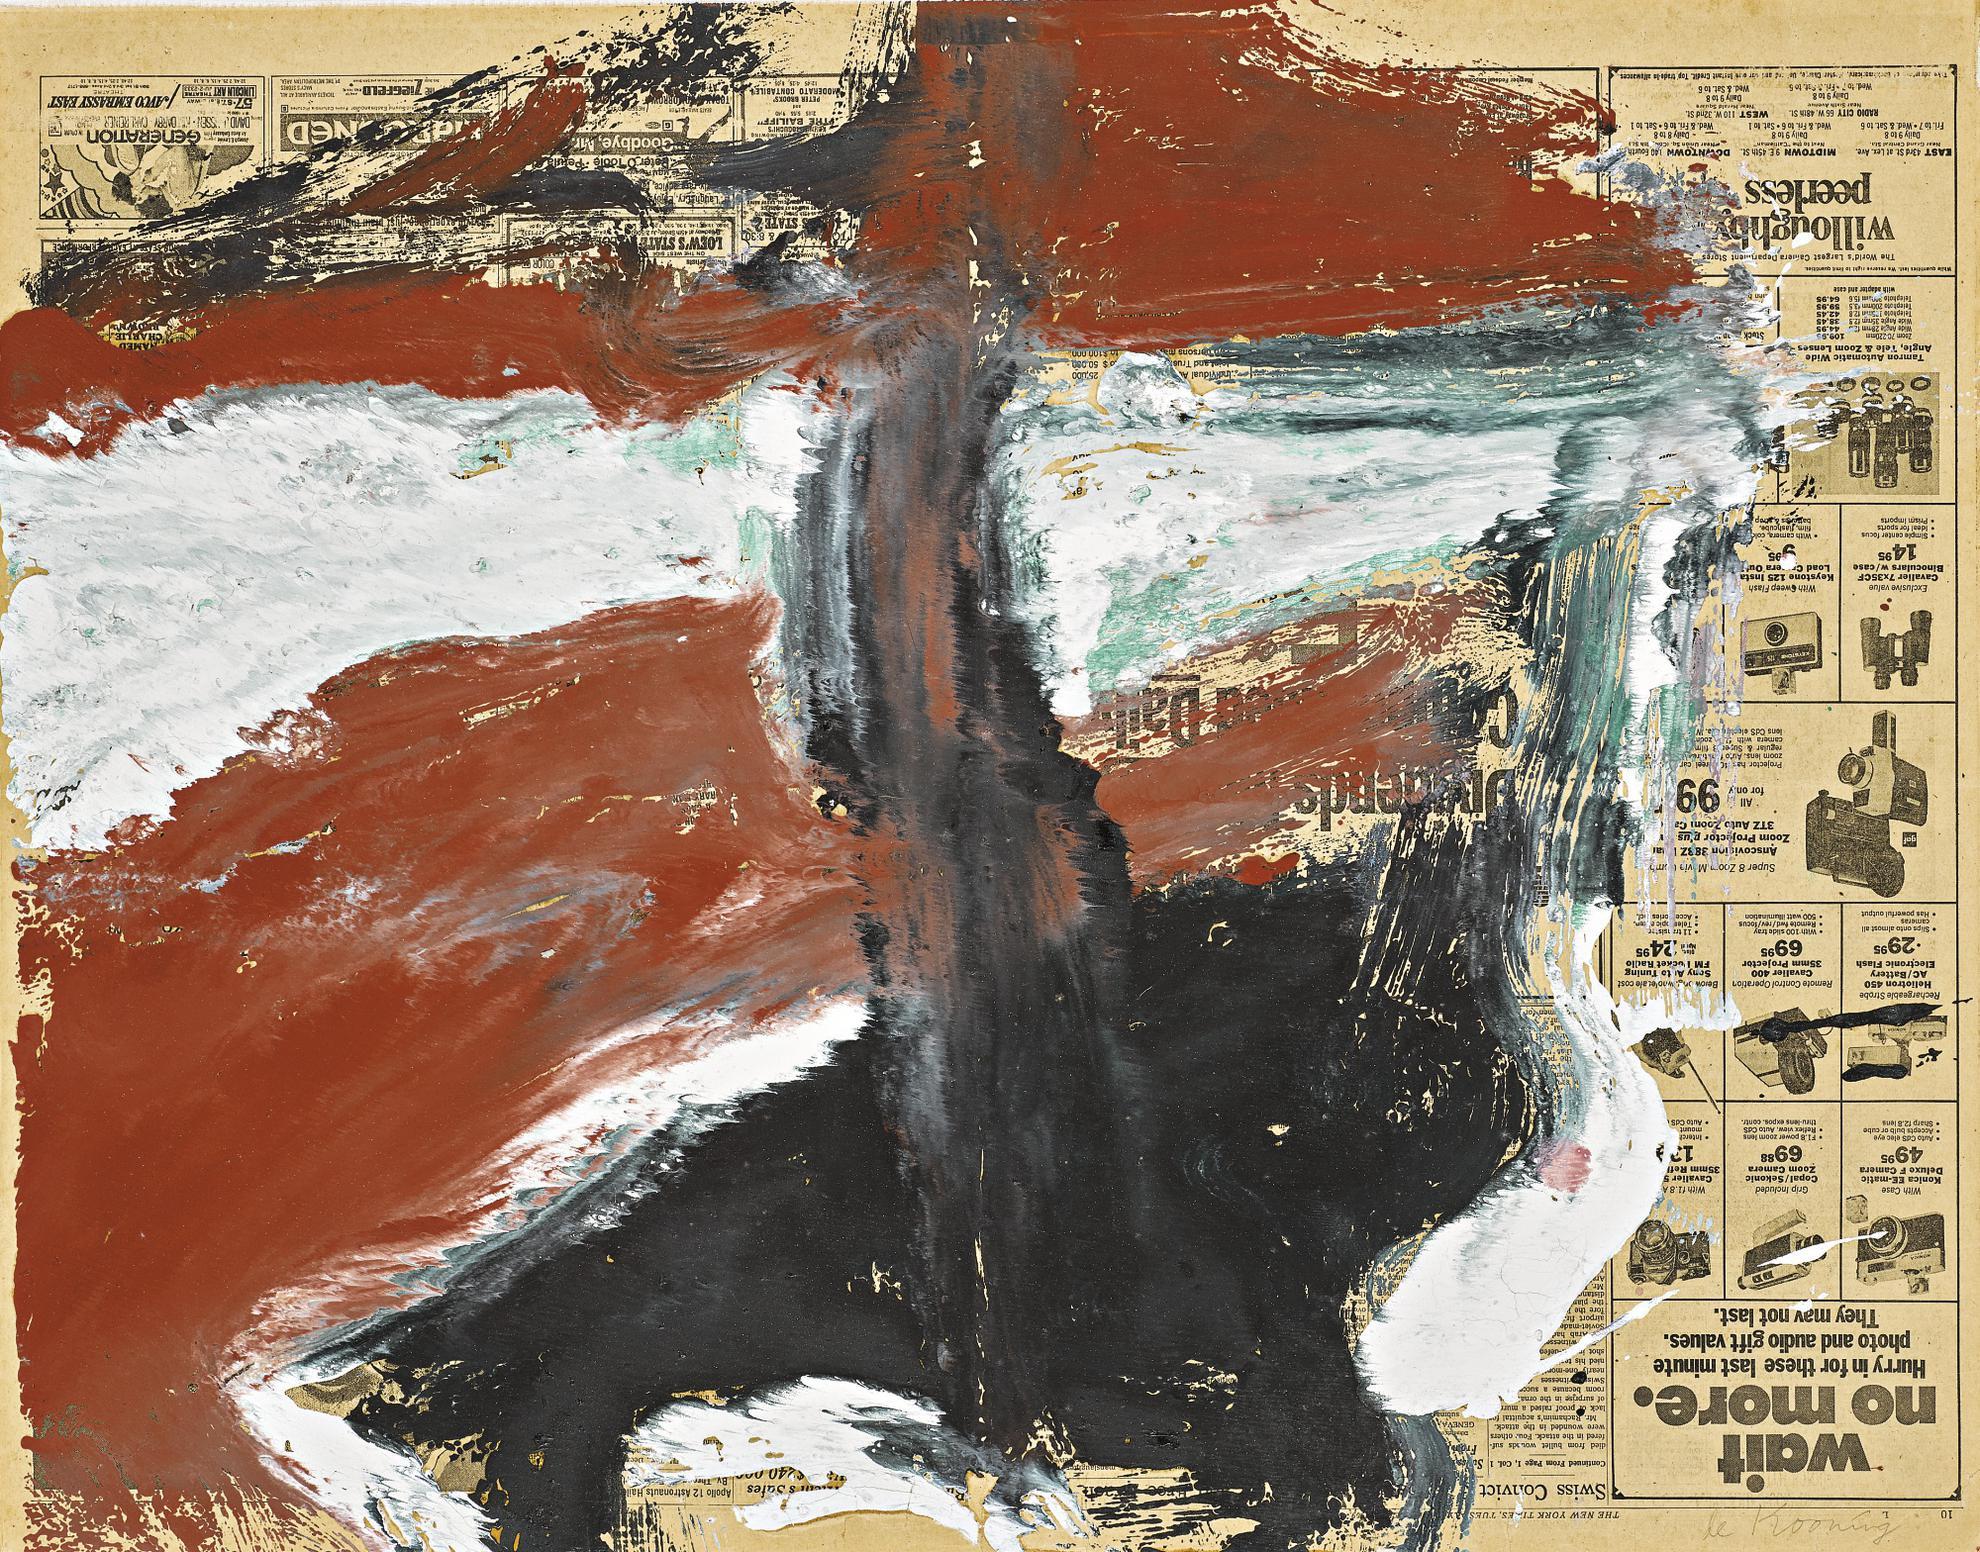 Willem de Kooning-Untitled-1969